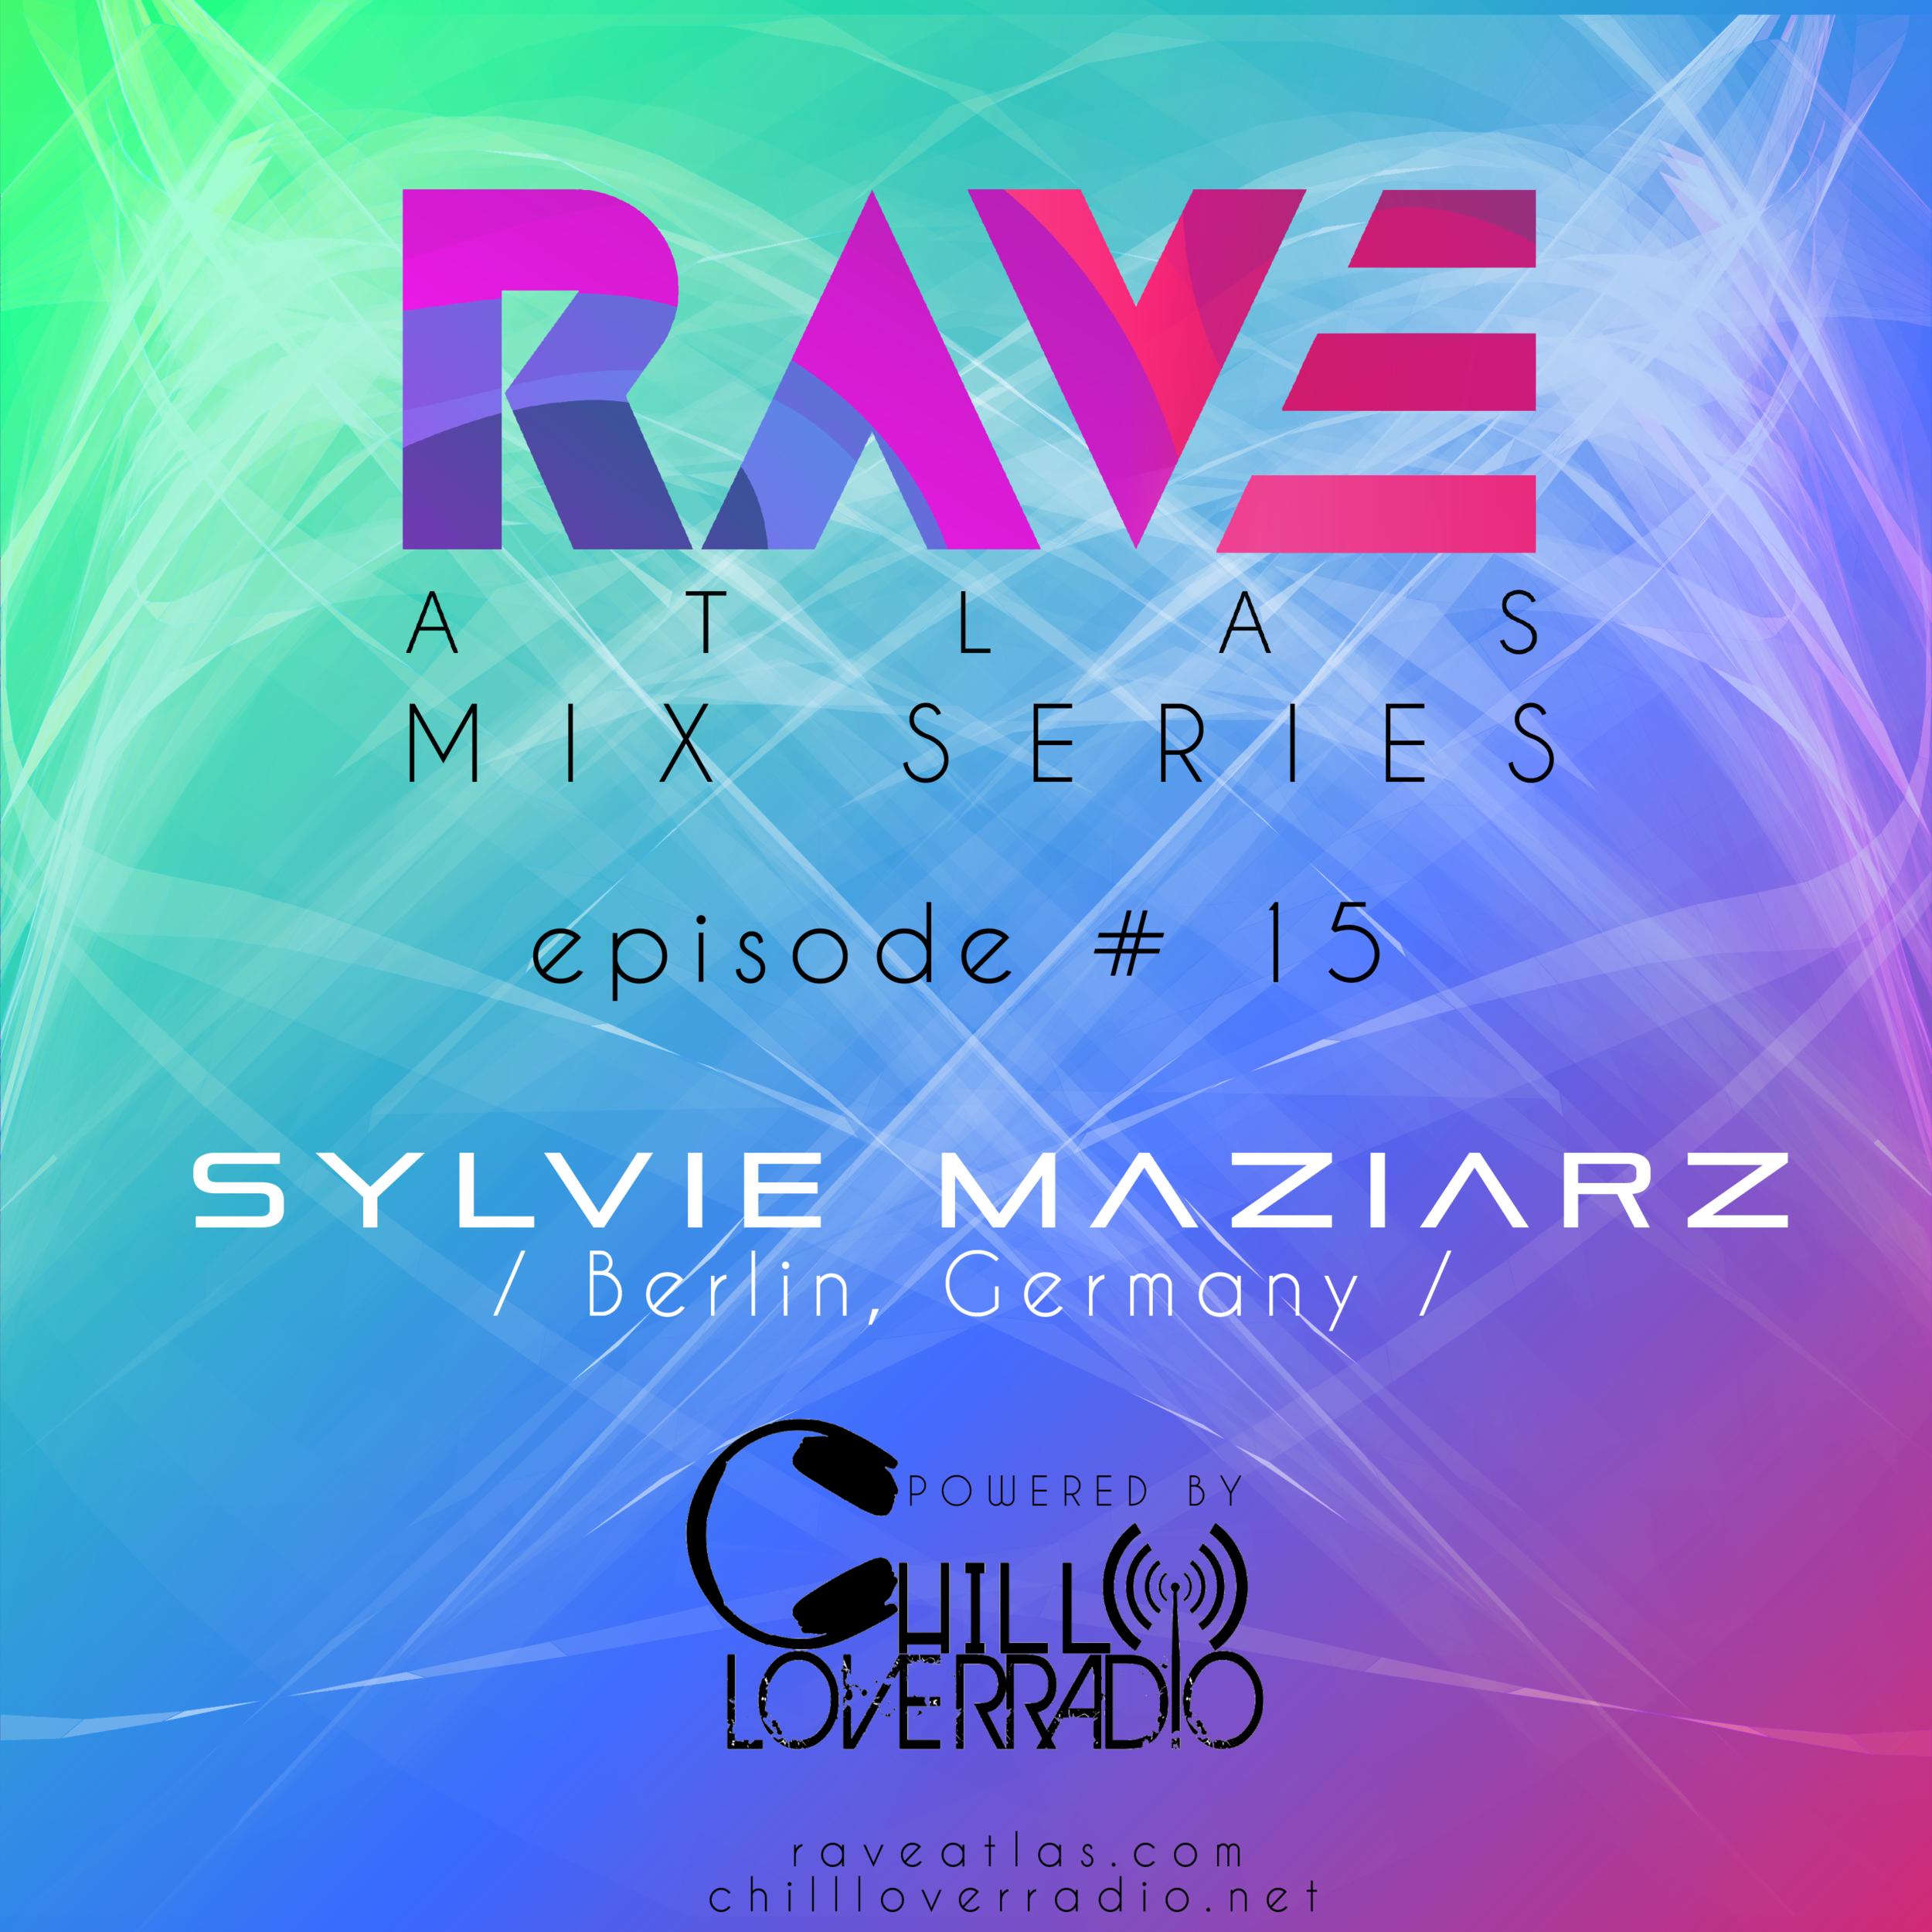 Rave Atlas Mix Series EP 015 - Sylvie Maziarz - Berlin, Germany